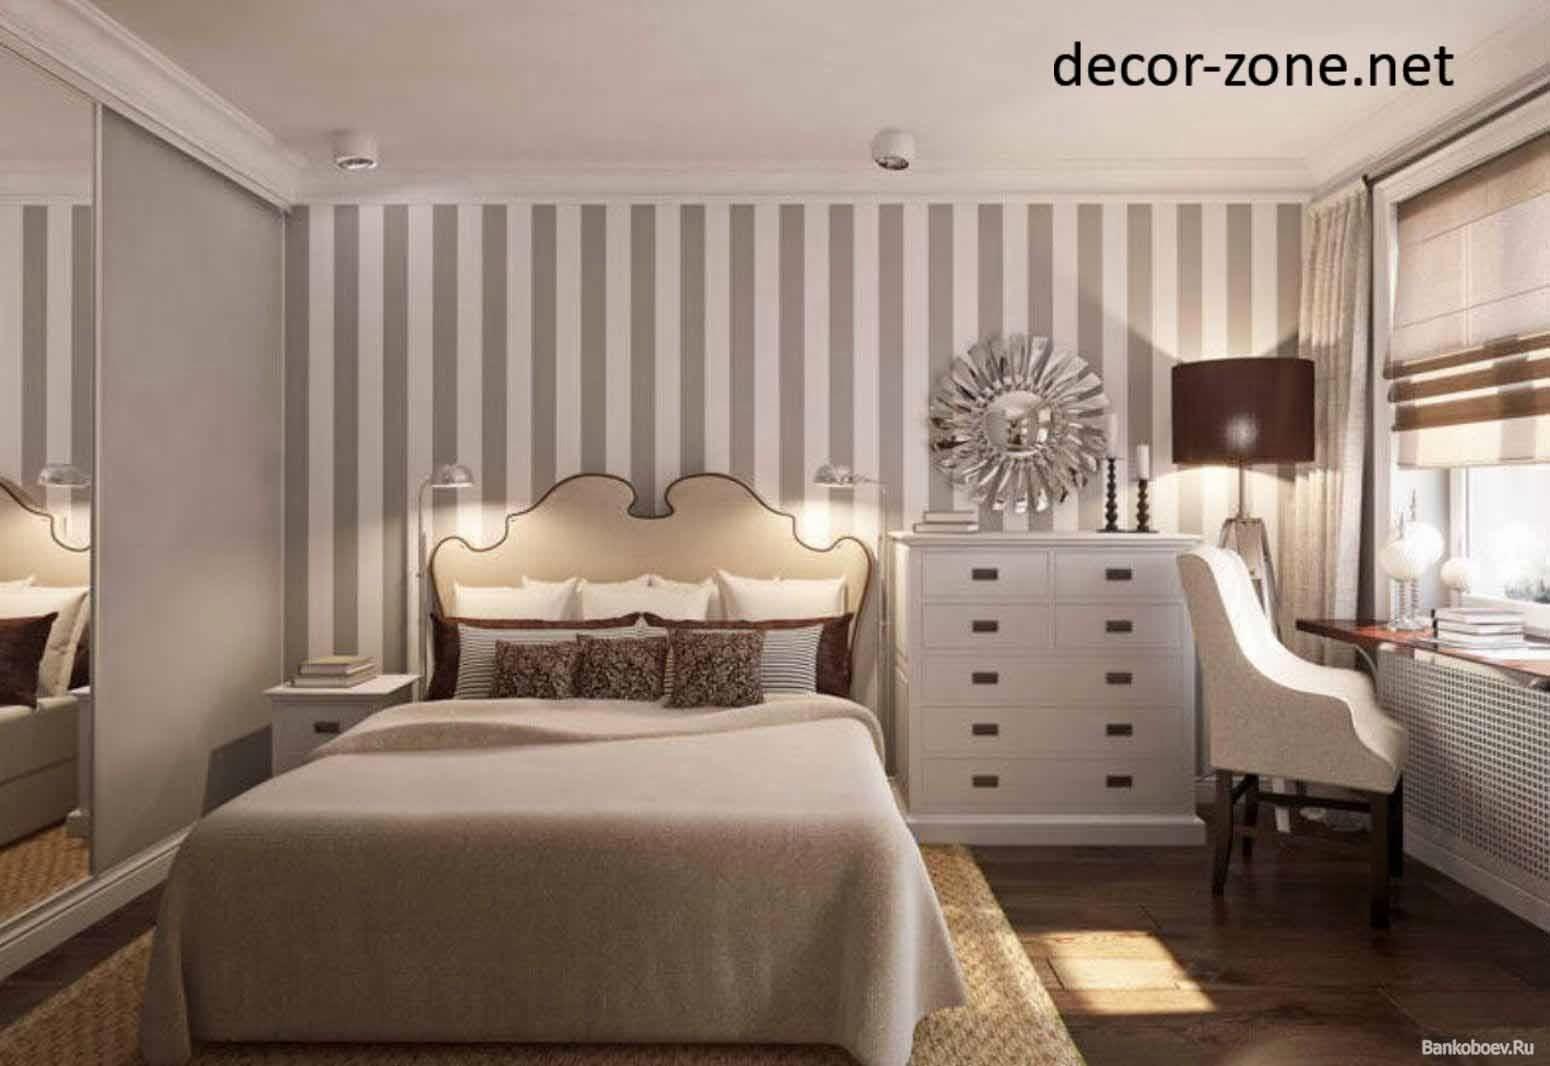 Gentil Master Bedroom Wallpaper Photo   8